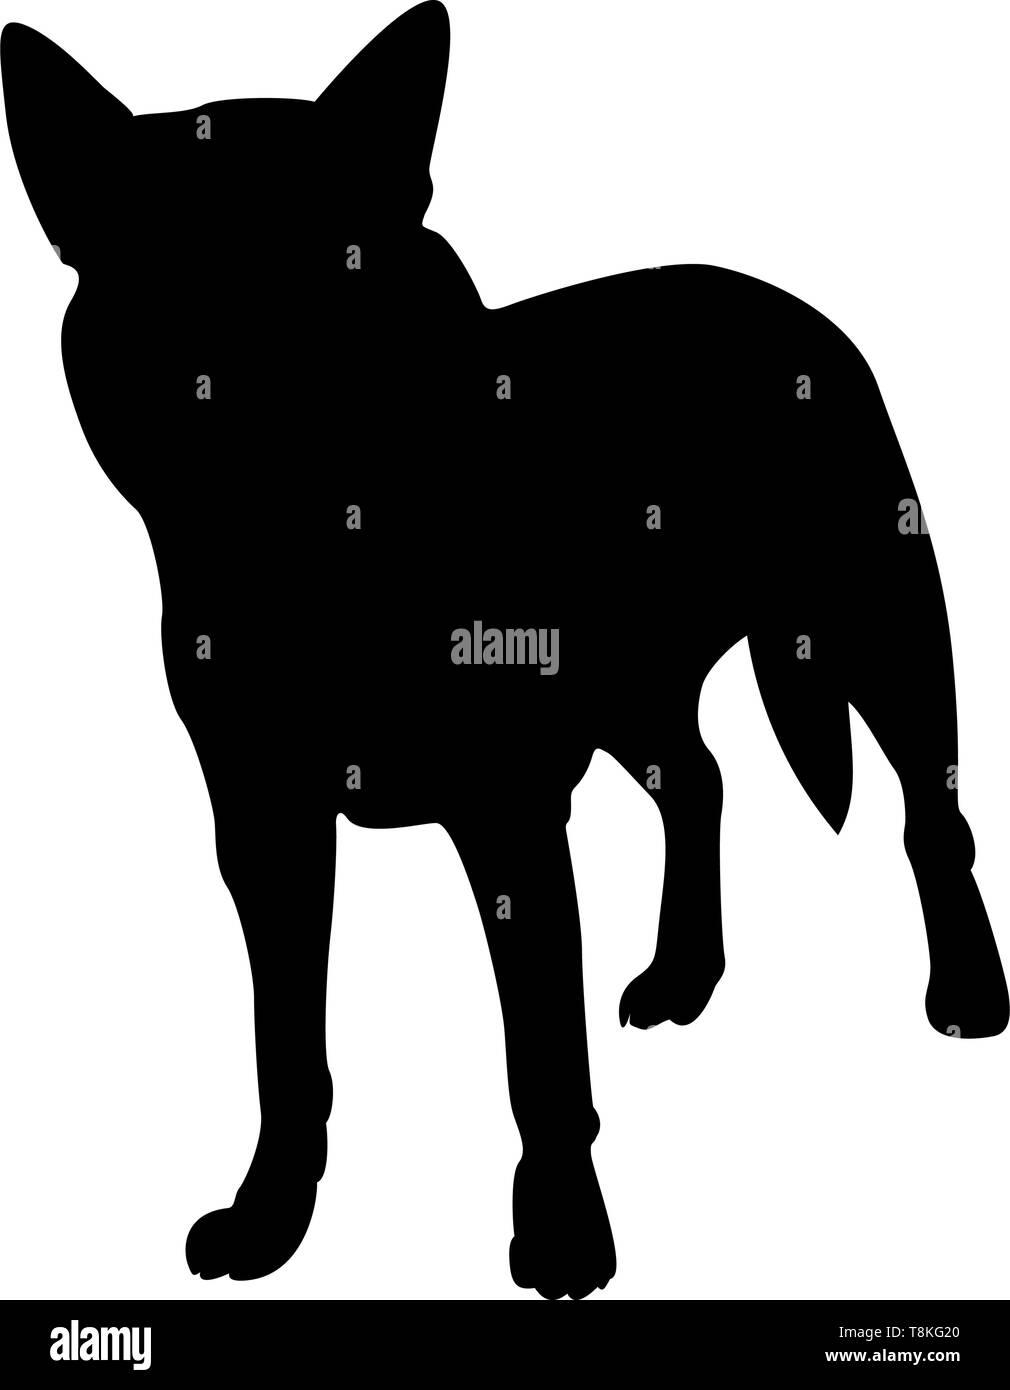 Australian Dog Silhouette. Smooth Vector Illustration. Stock Vector